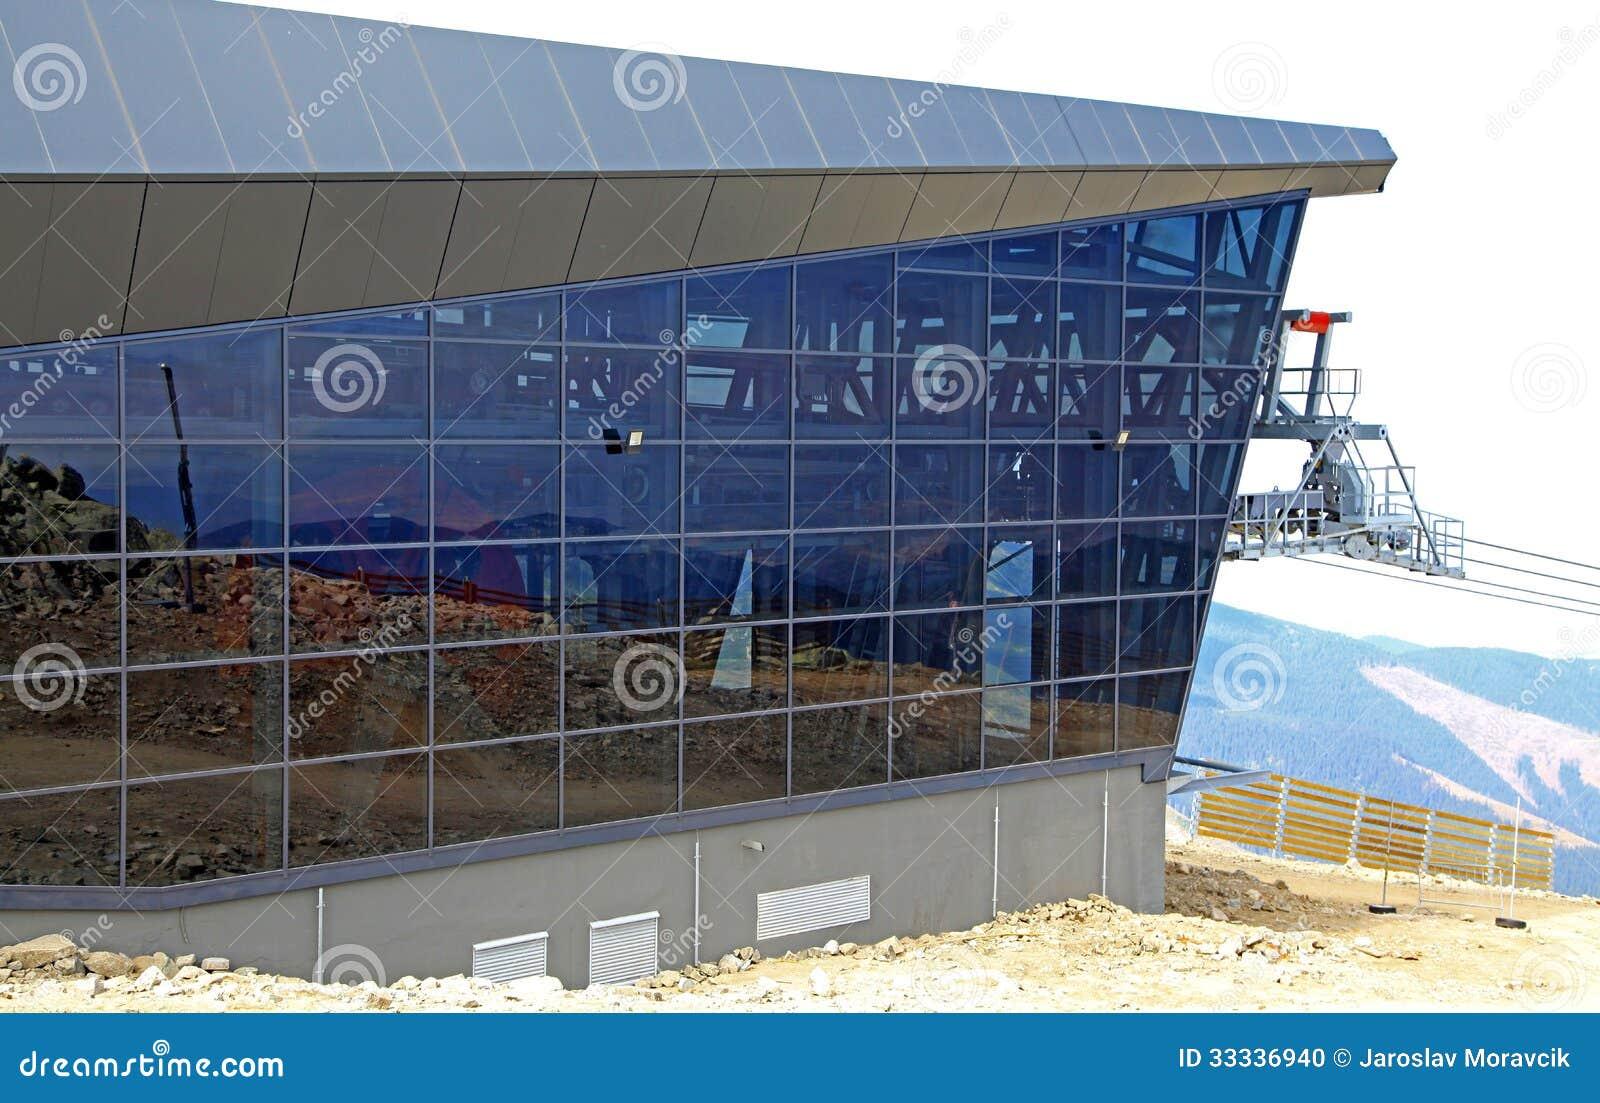 Funitel modern ropeway editorial image image 33336940 for Moderne skihotels